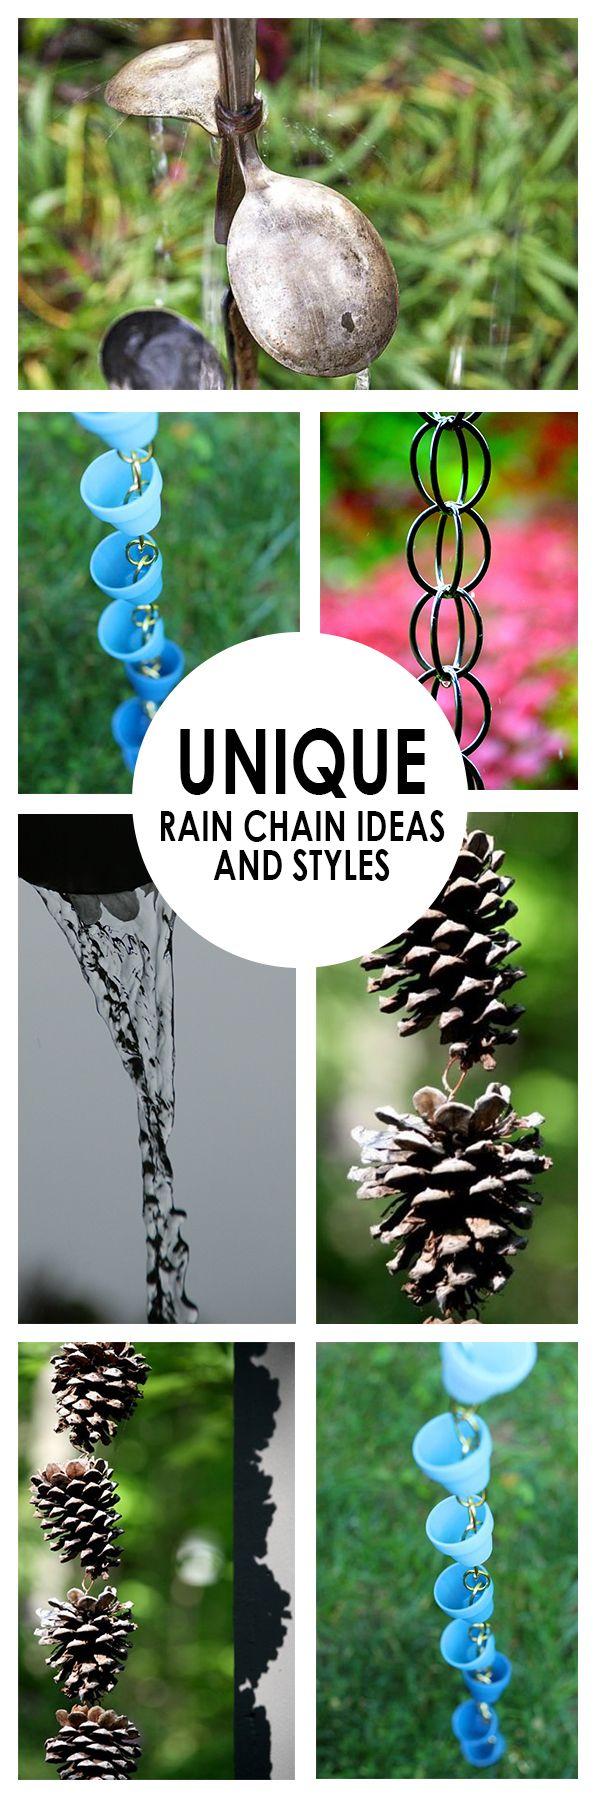 Garden Ideas And Outdoor Living 12 best plastic plant pots images on pinterest | gardening